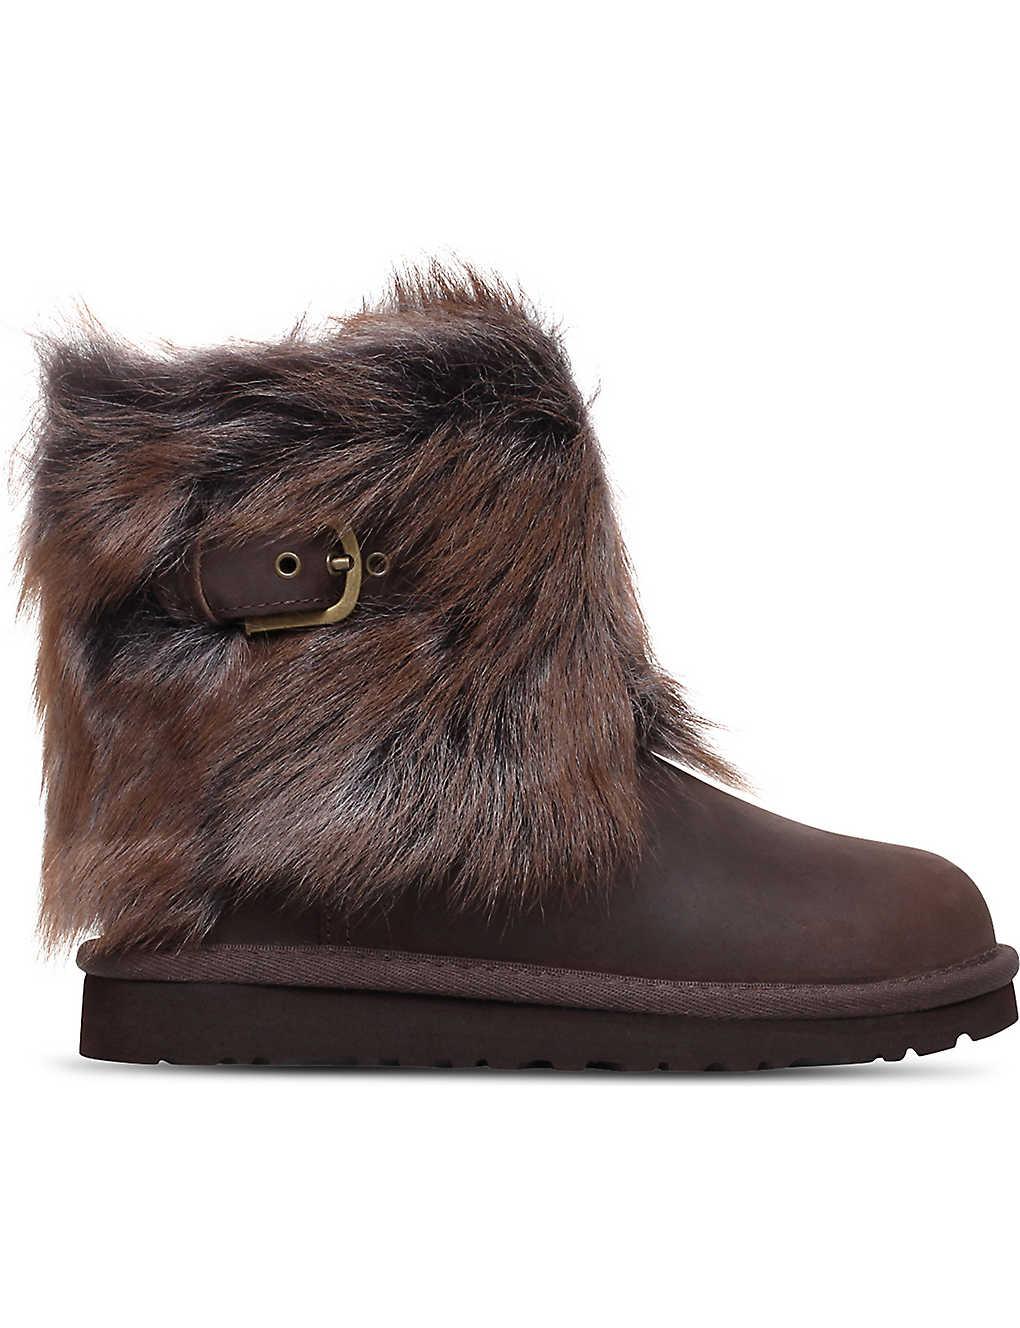 b3d168362c8 UGG - Ellee leather and sheepskin boots 4-8 years | Selfridges.com